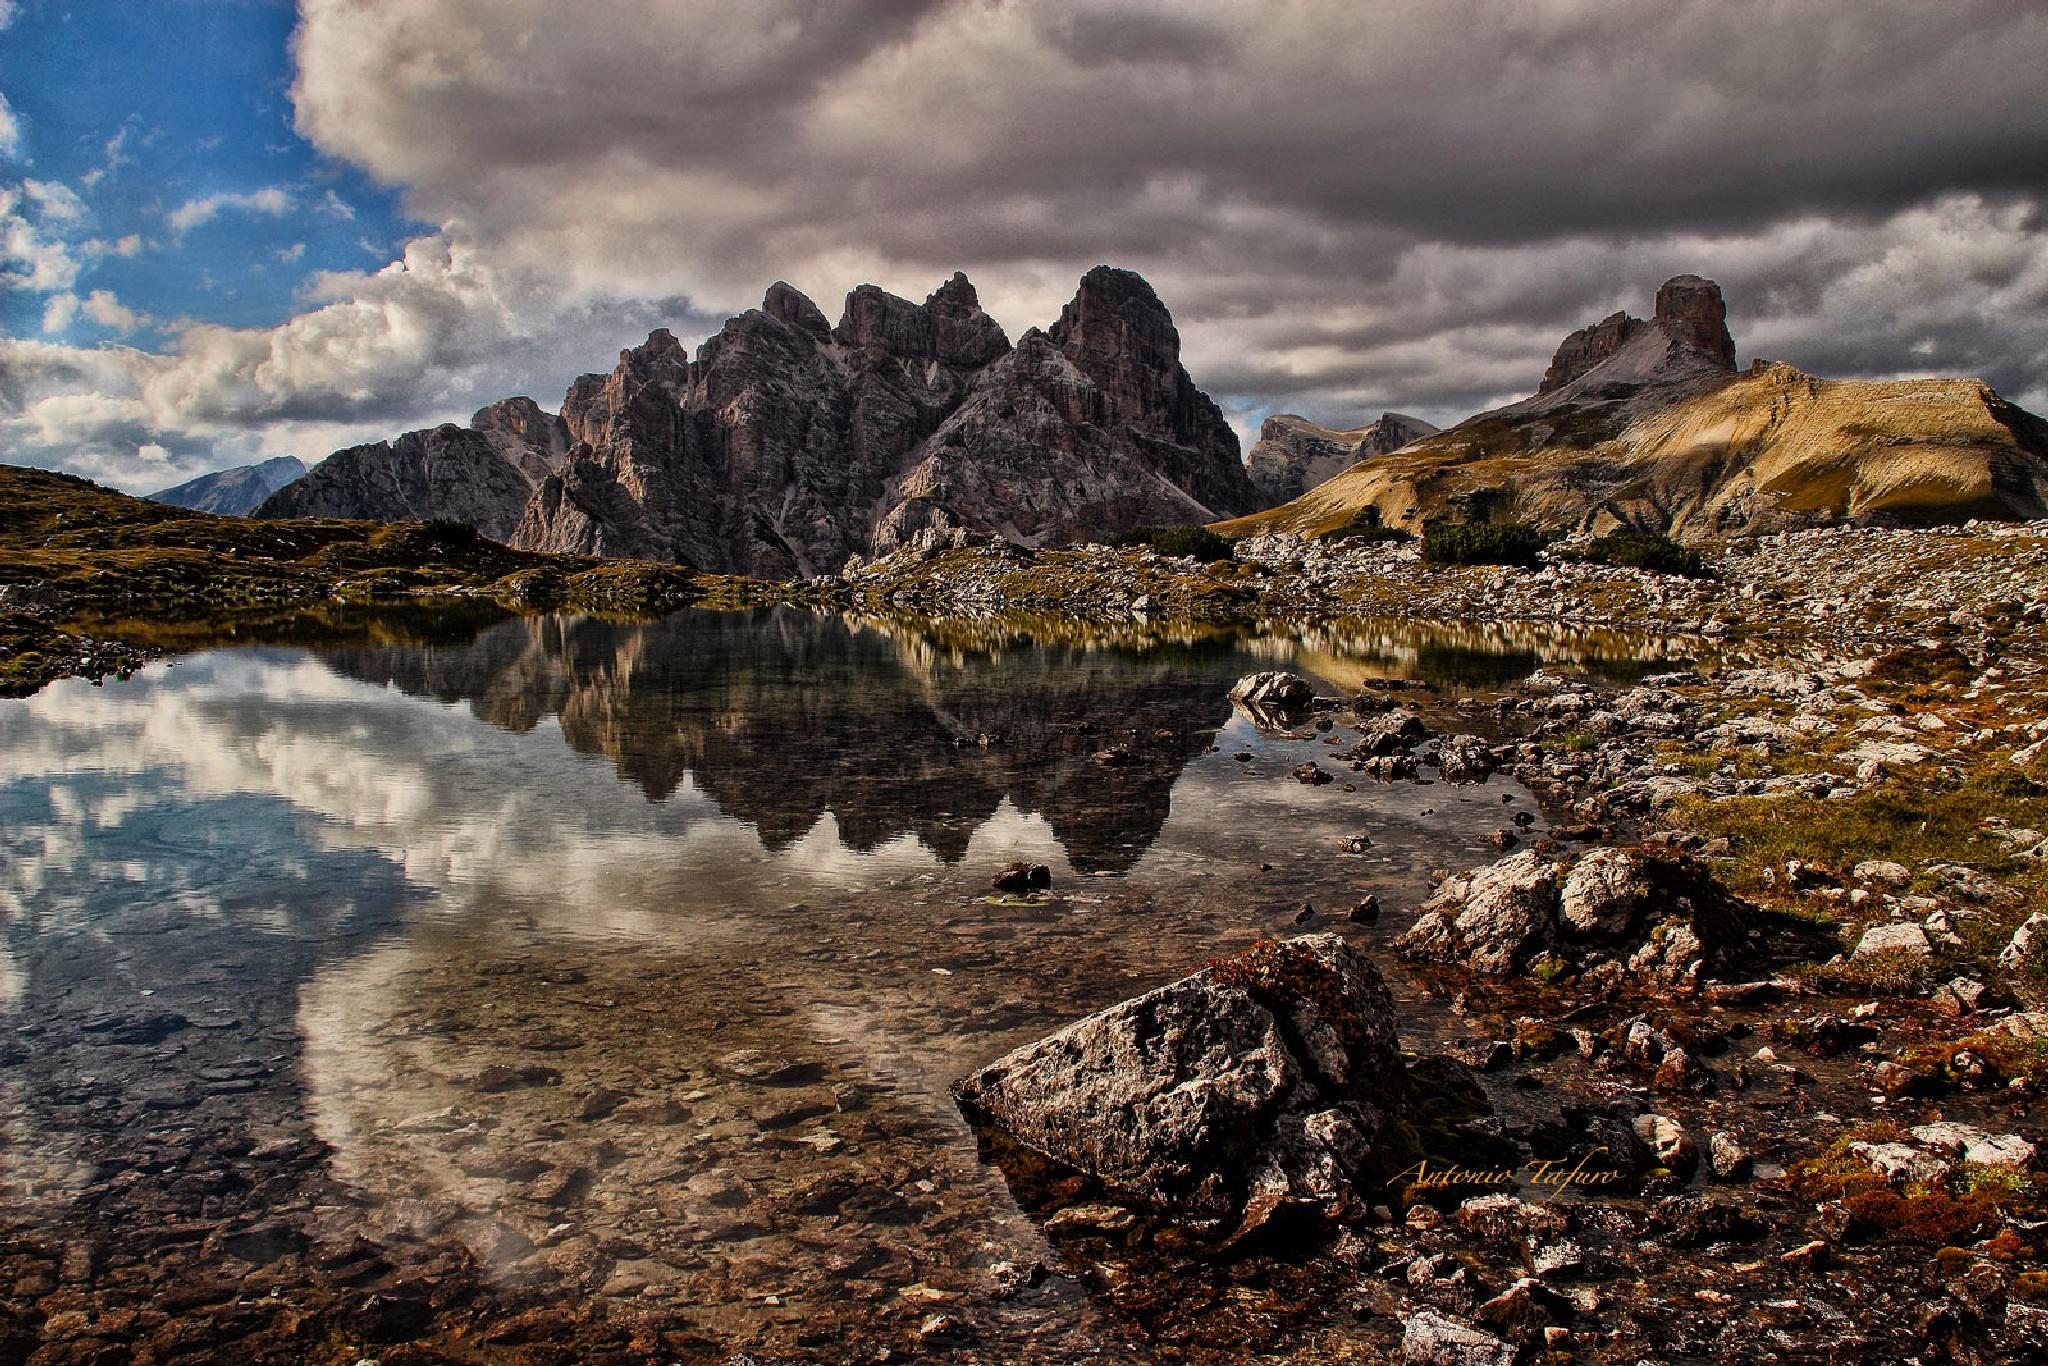 Dolomiti by Antonio Tafuro